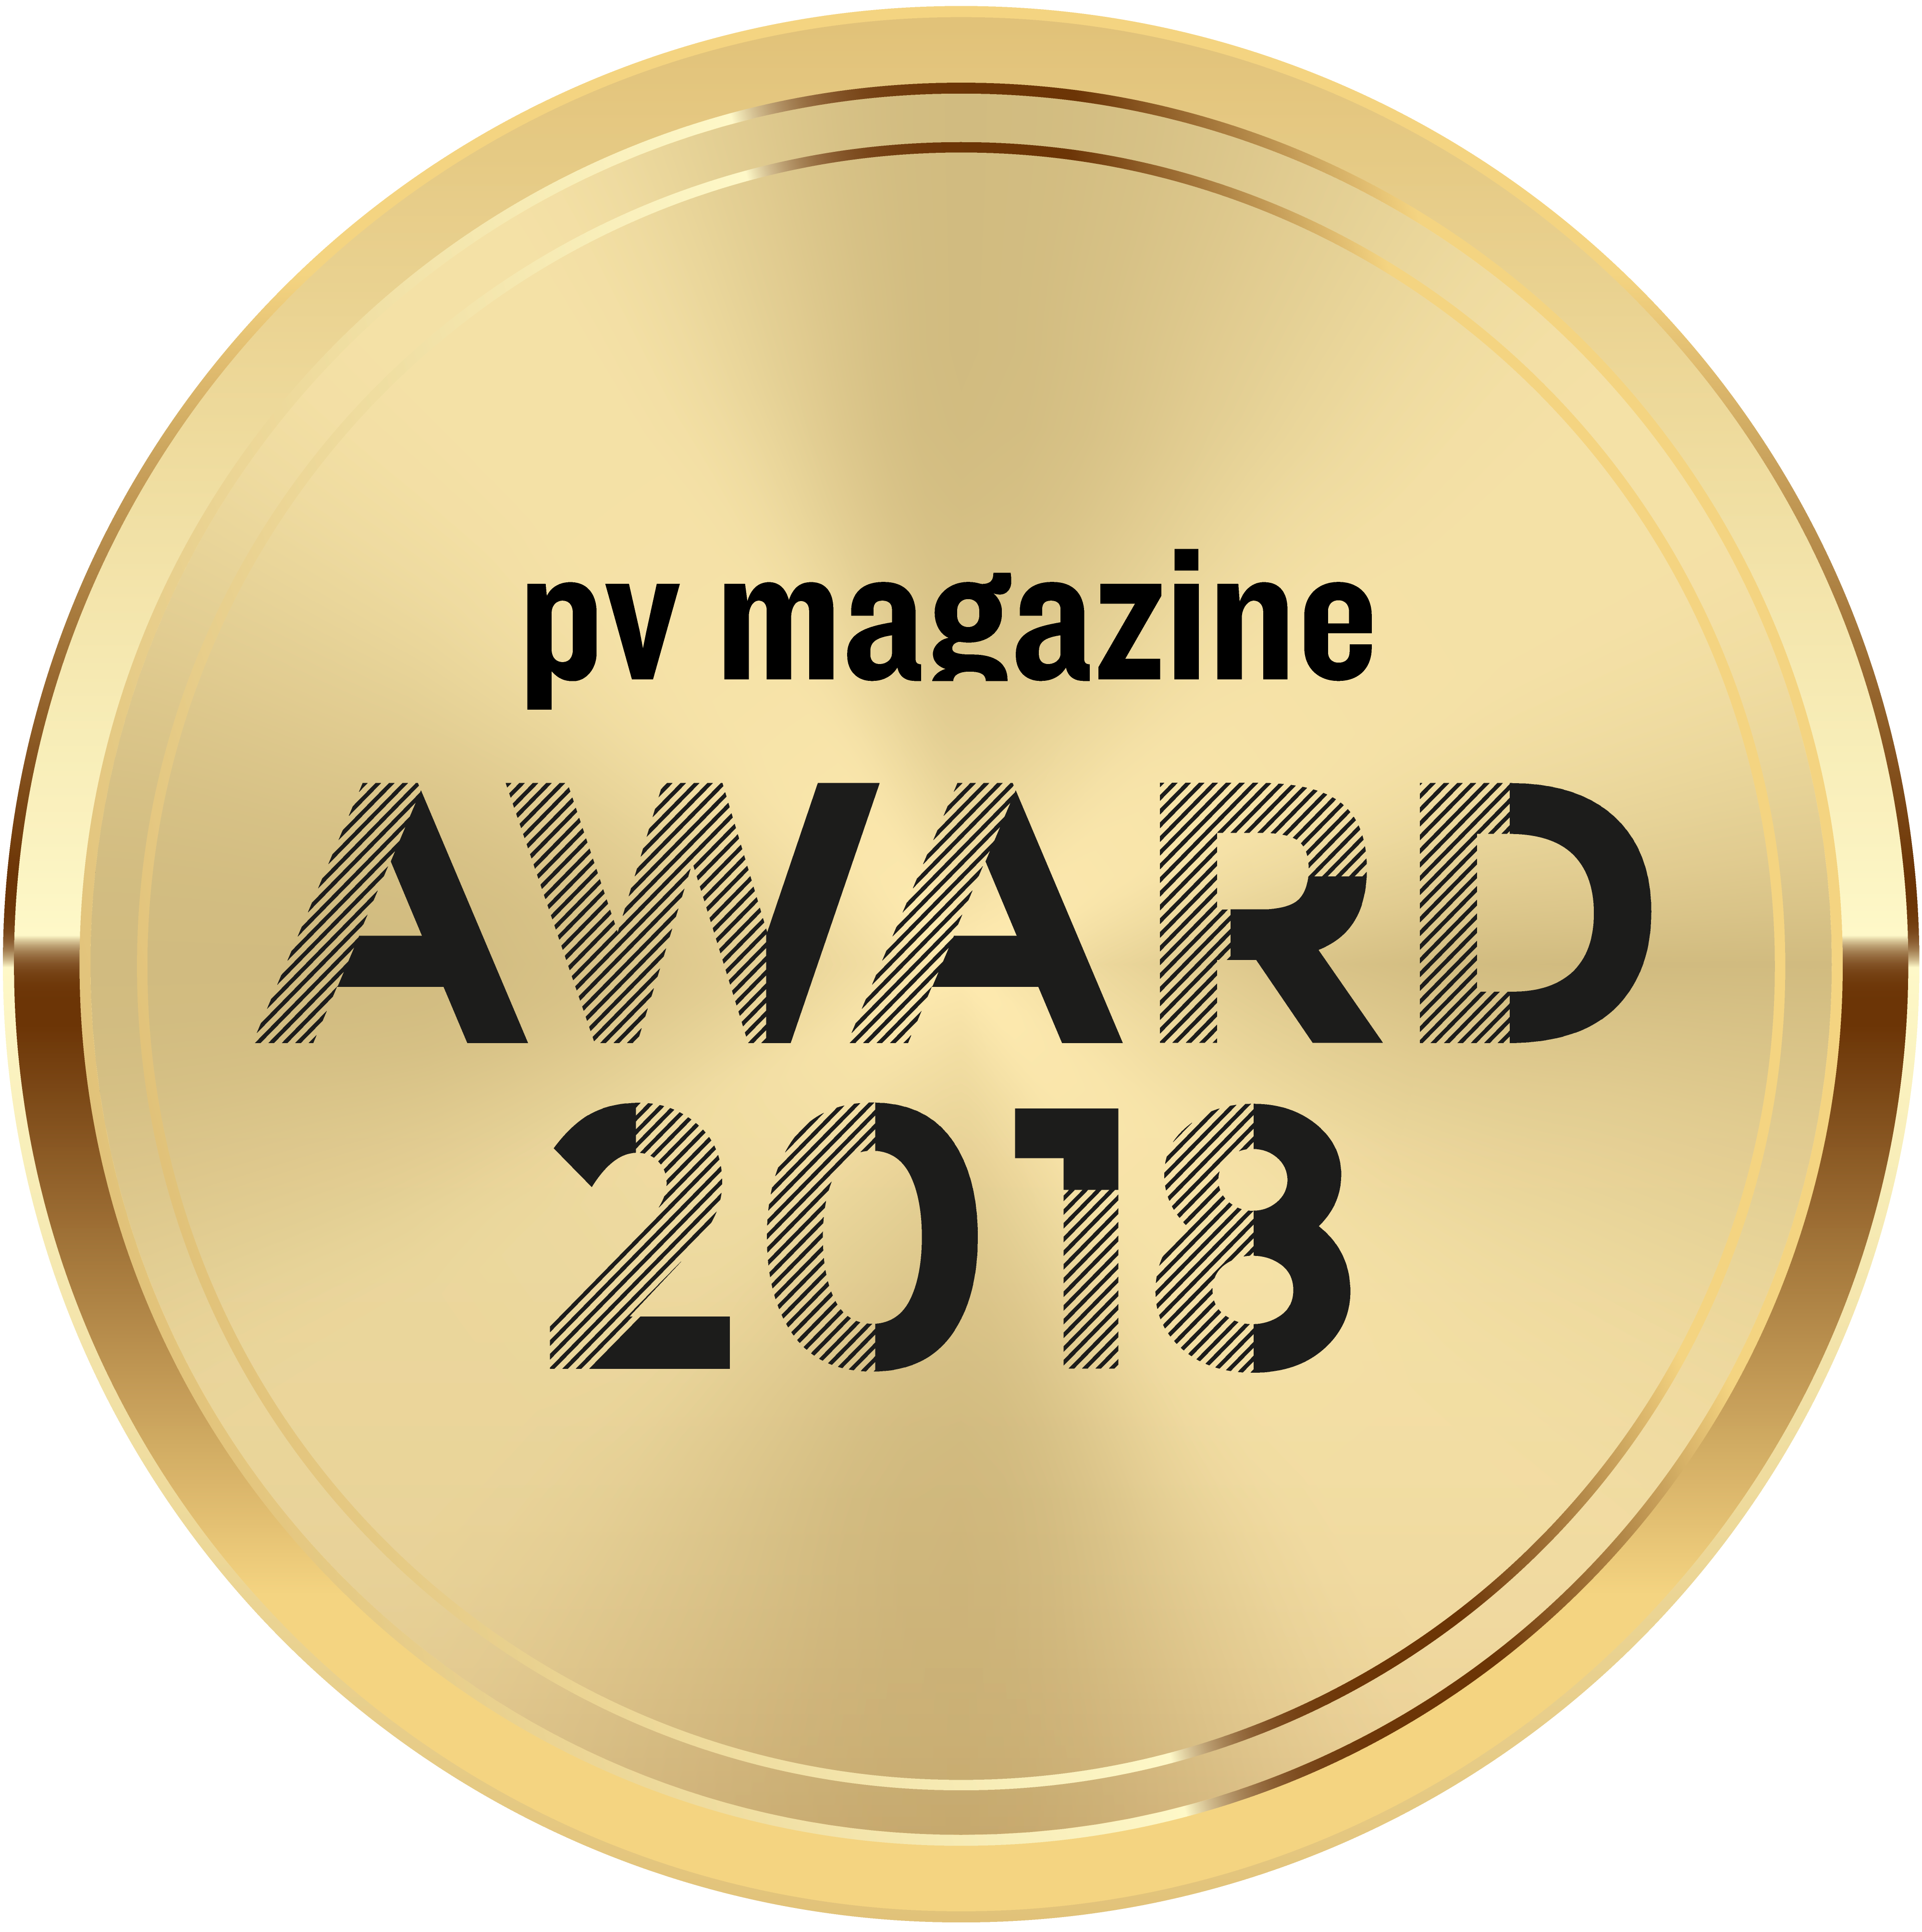 PV Magazine - Award